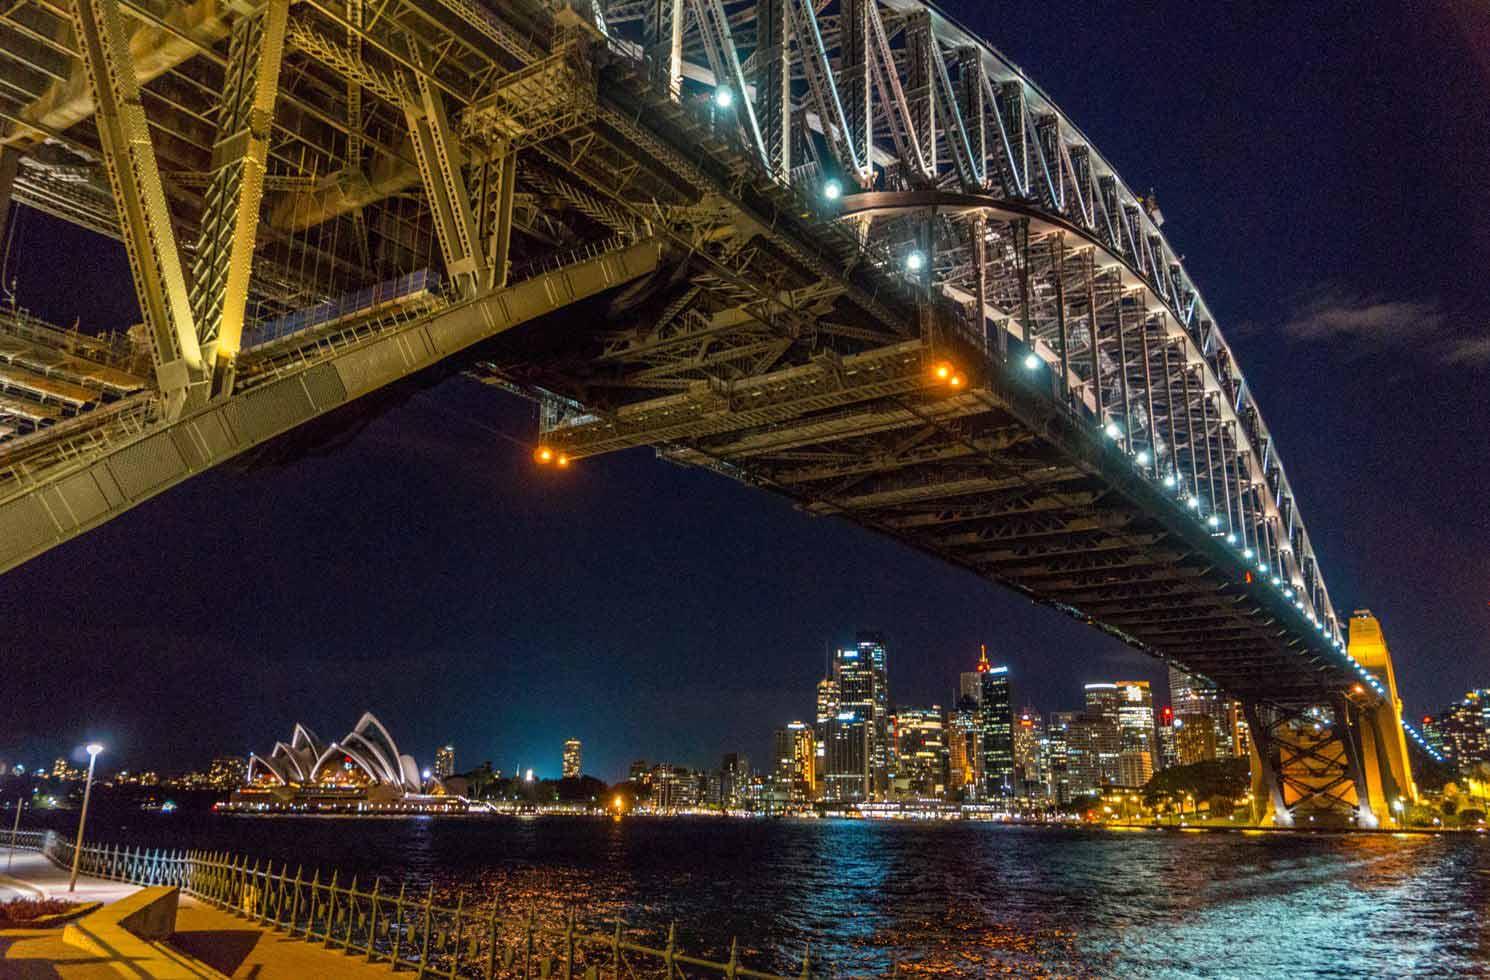 Berühmte Brücke an der Oper in Sydney